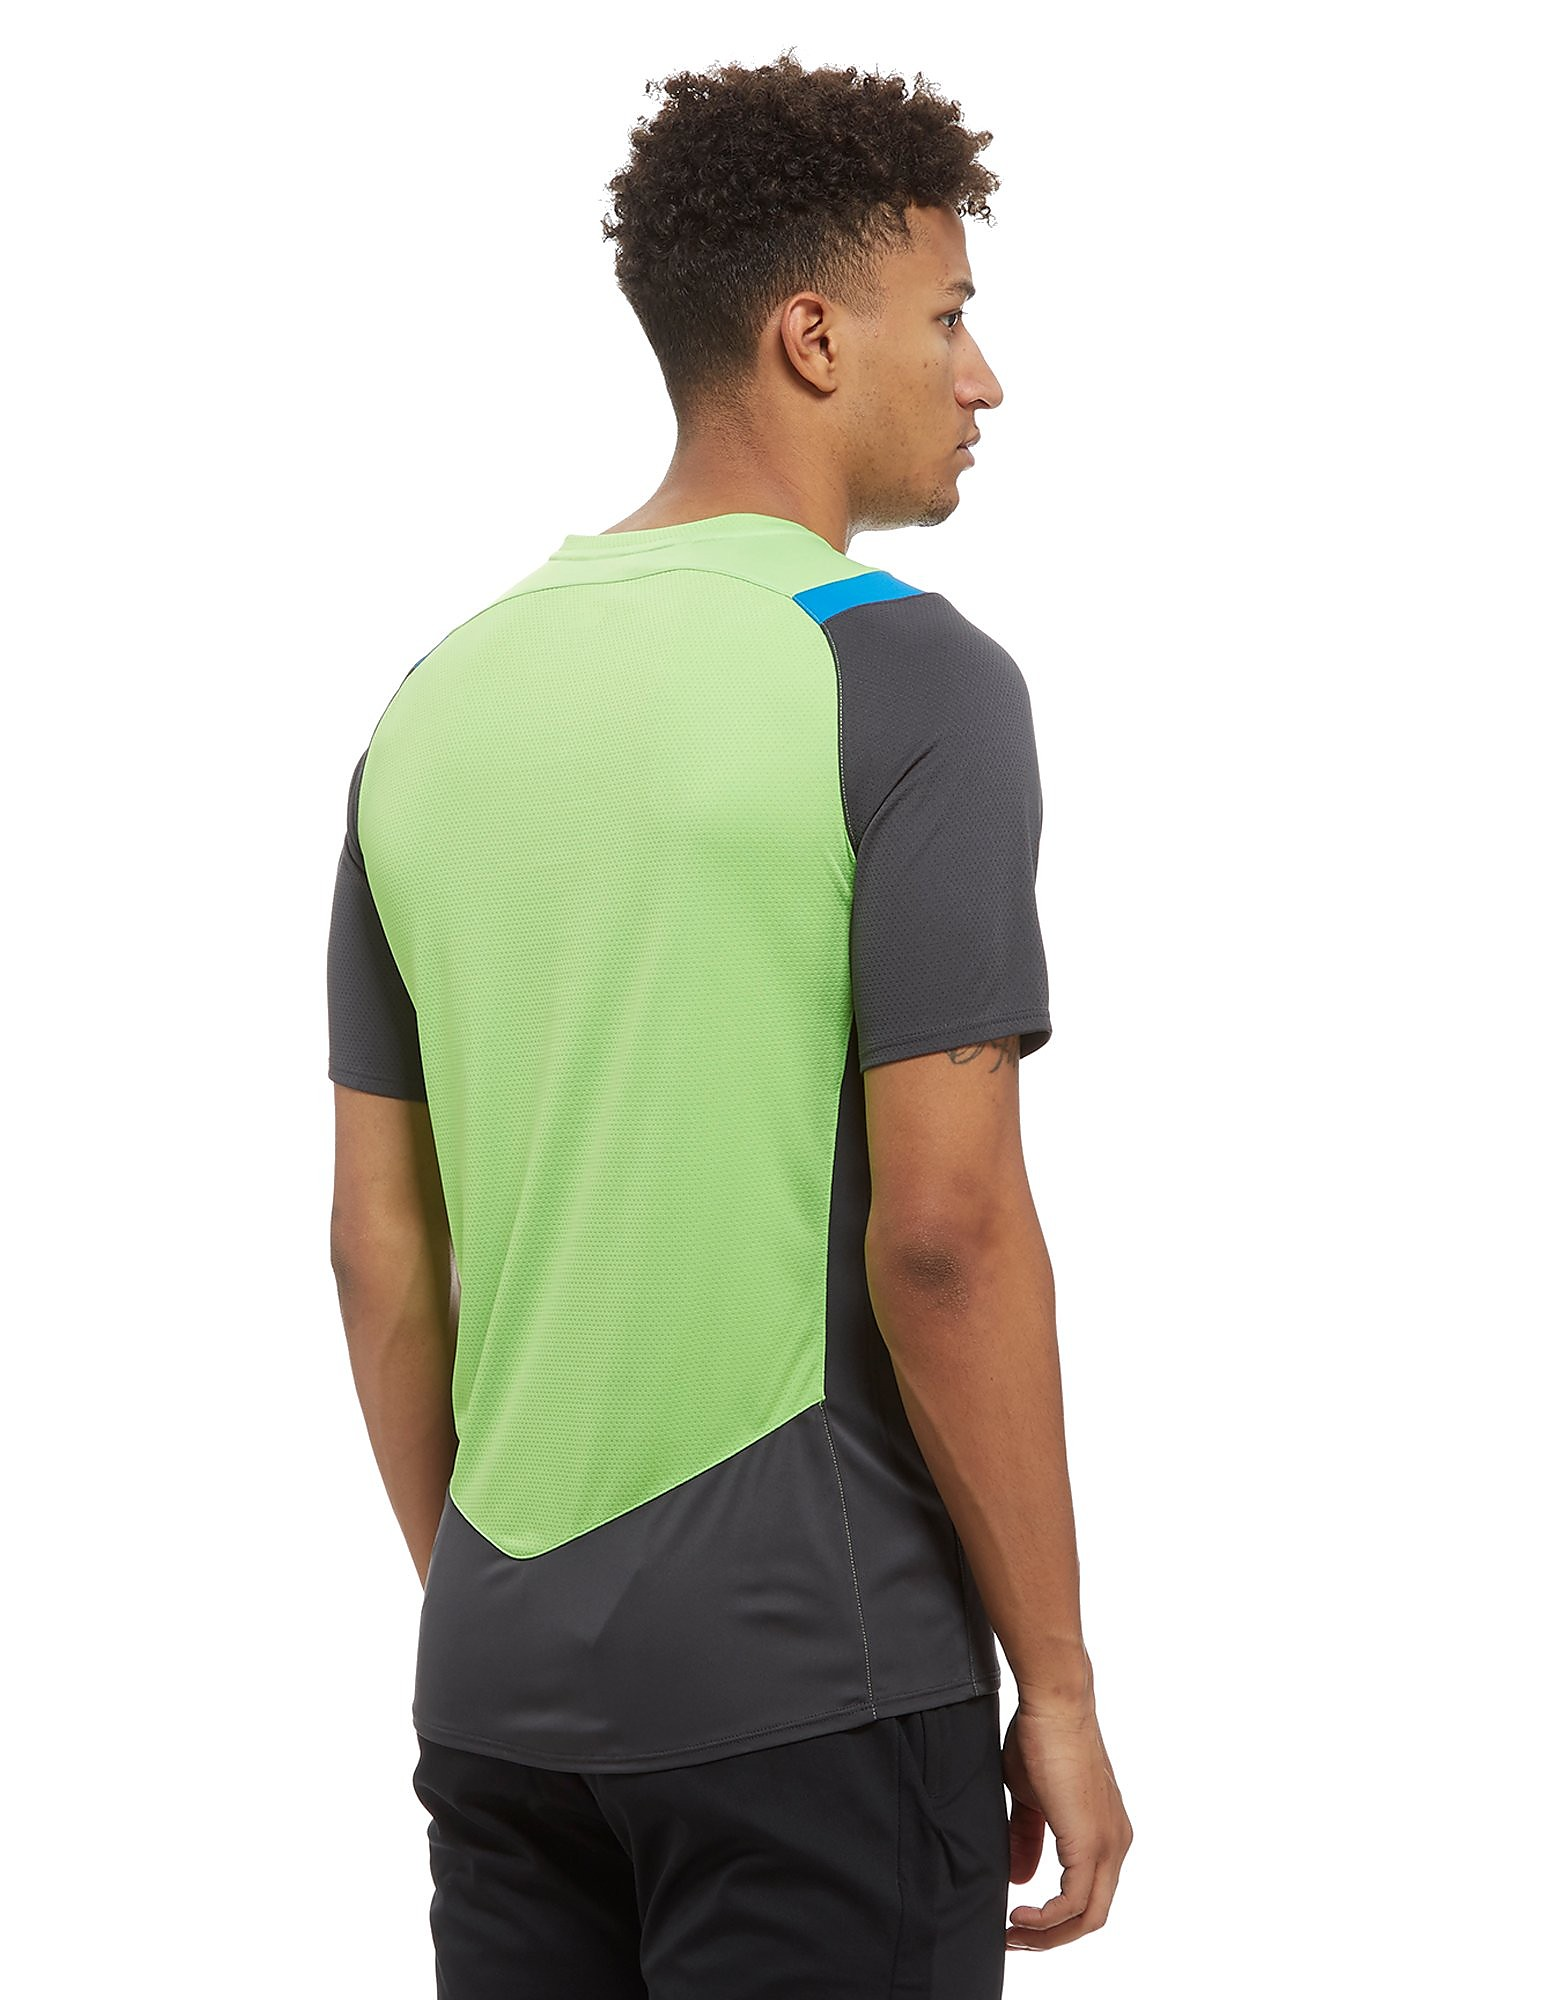 Canterbury Ireland RFU Short Sleeve T-Shirt